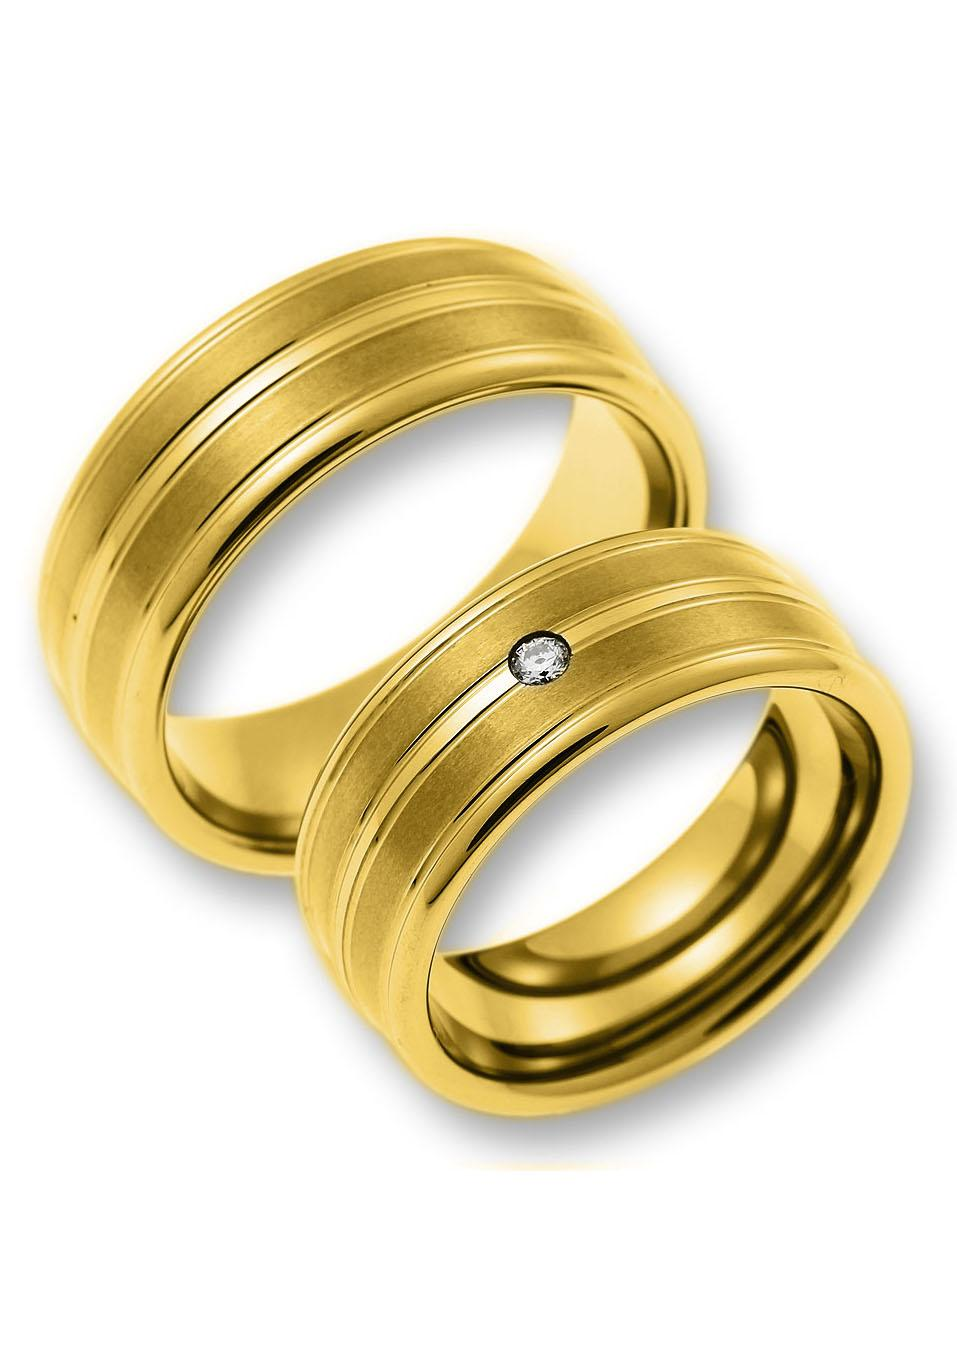 CORE by Schumann Design Partnerring »TW011, 09/19013843, TW011.03/10008958« | Schmuck > Ringe > Partnerringe | Goldfarben | CORE BY SCHUMANN DESIGN